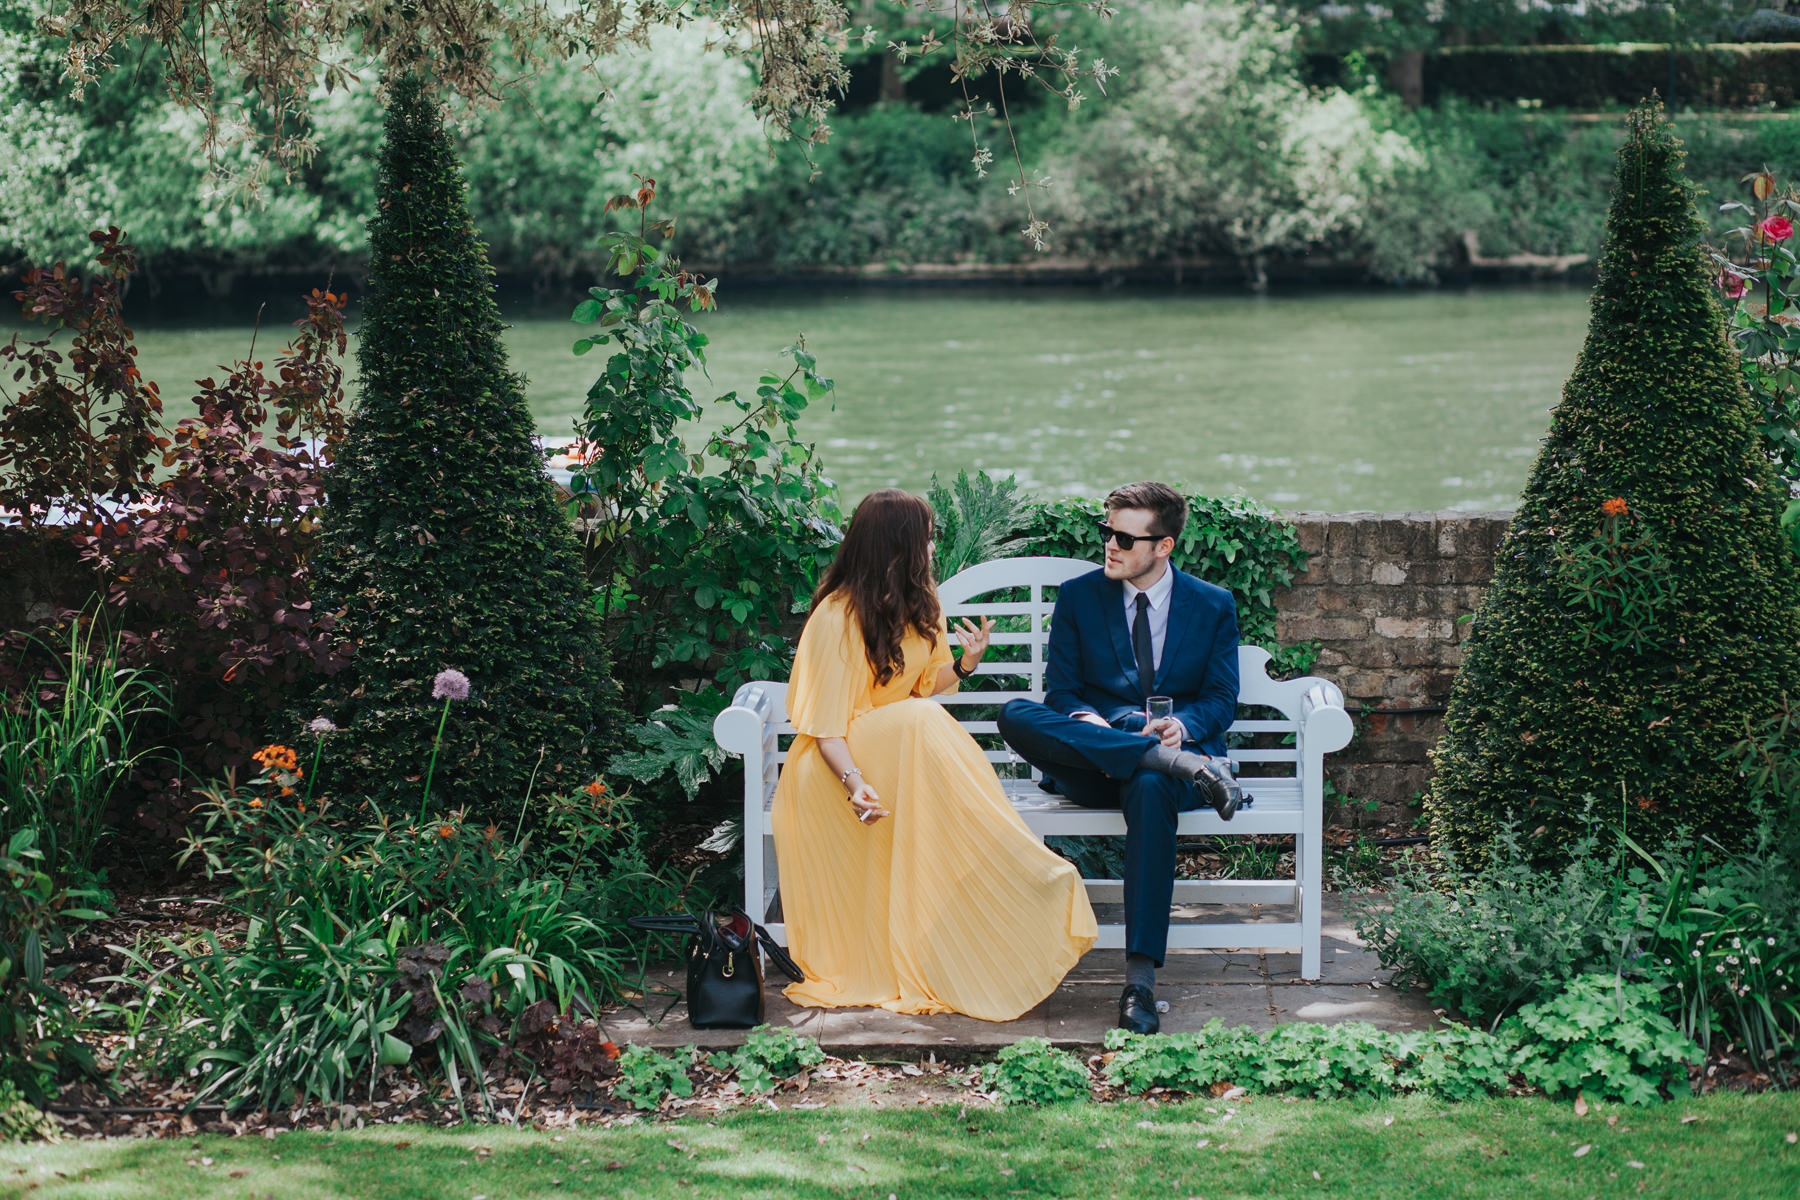 CRL-287-The Bingham wedding Richmond-reportage guest candid photographer.jpg